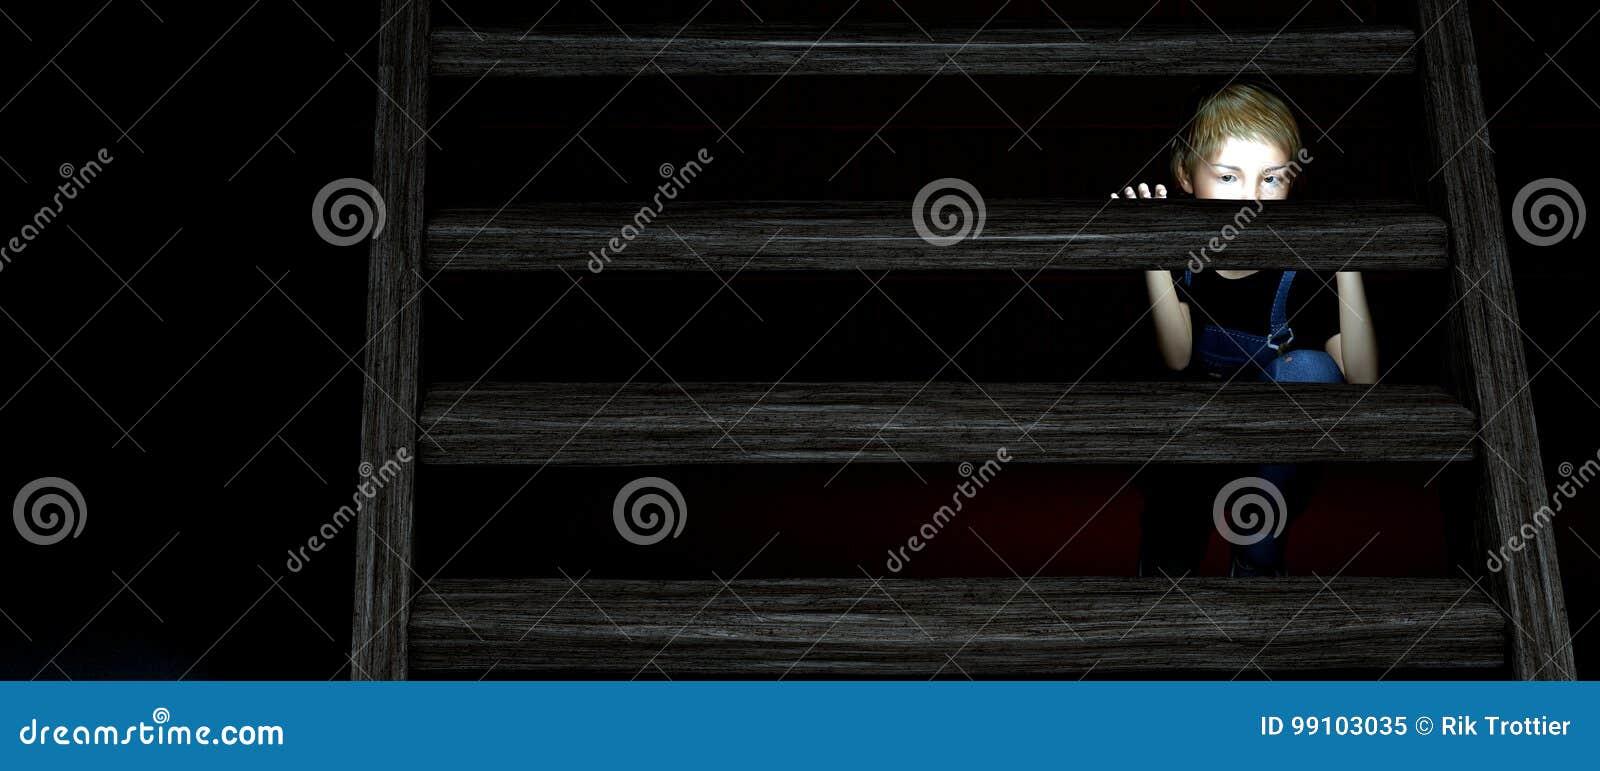 dark basement stairs. Contemporary Basement Download Child Hiding Under Stairs Stock Illustration Illustration Of Eyes   99103035 On Dark Basement